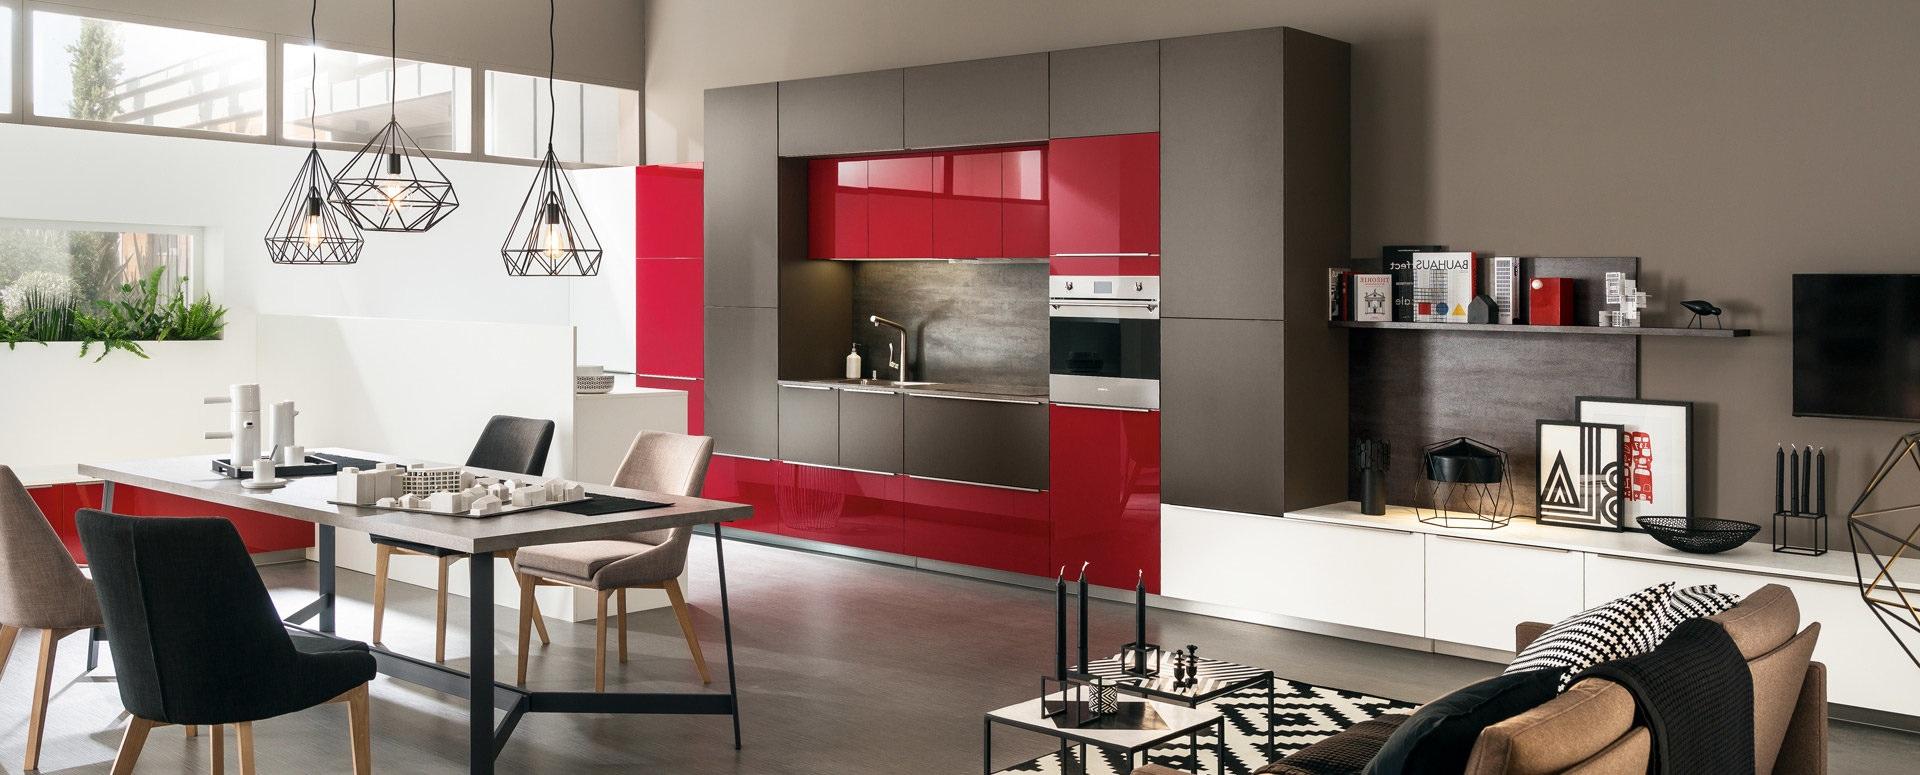 Cuisine Ouverte Moderne Rouge